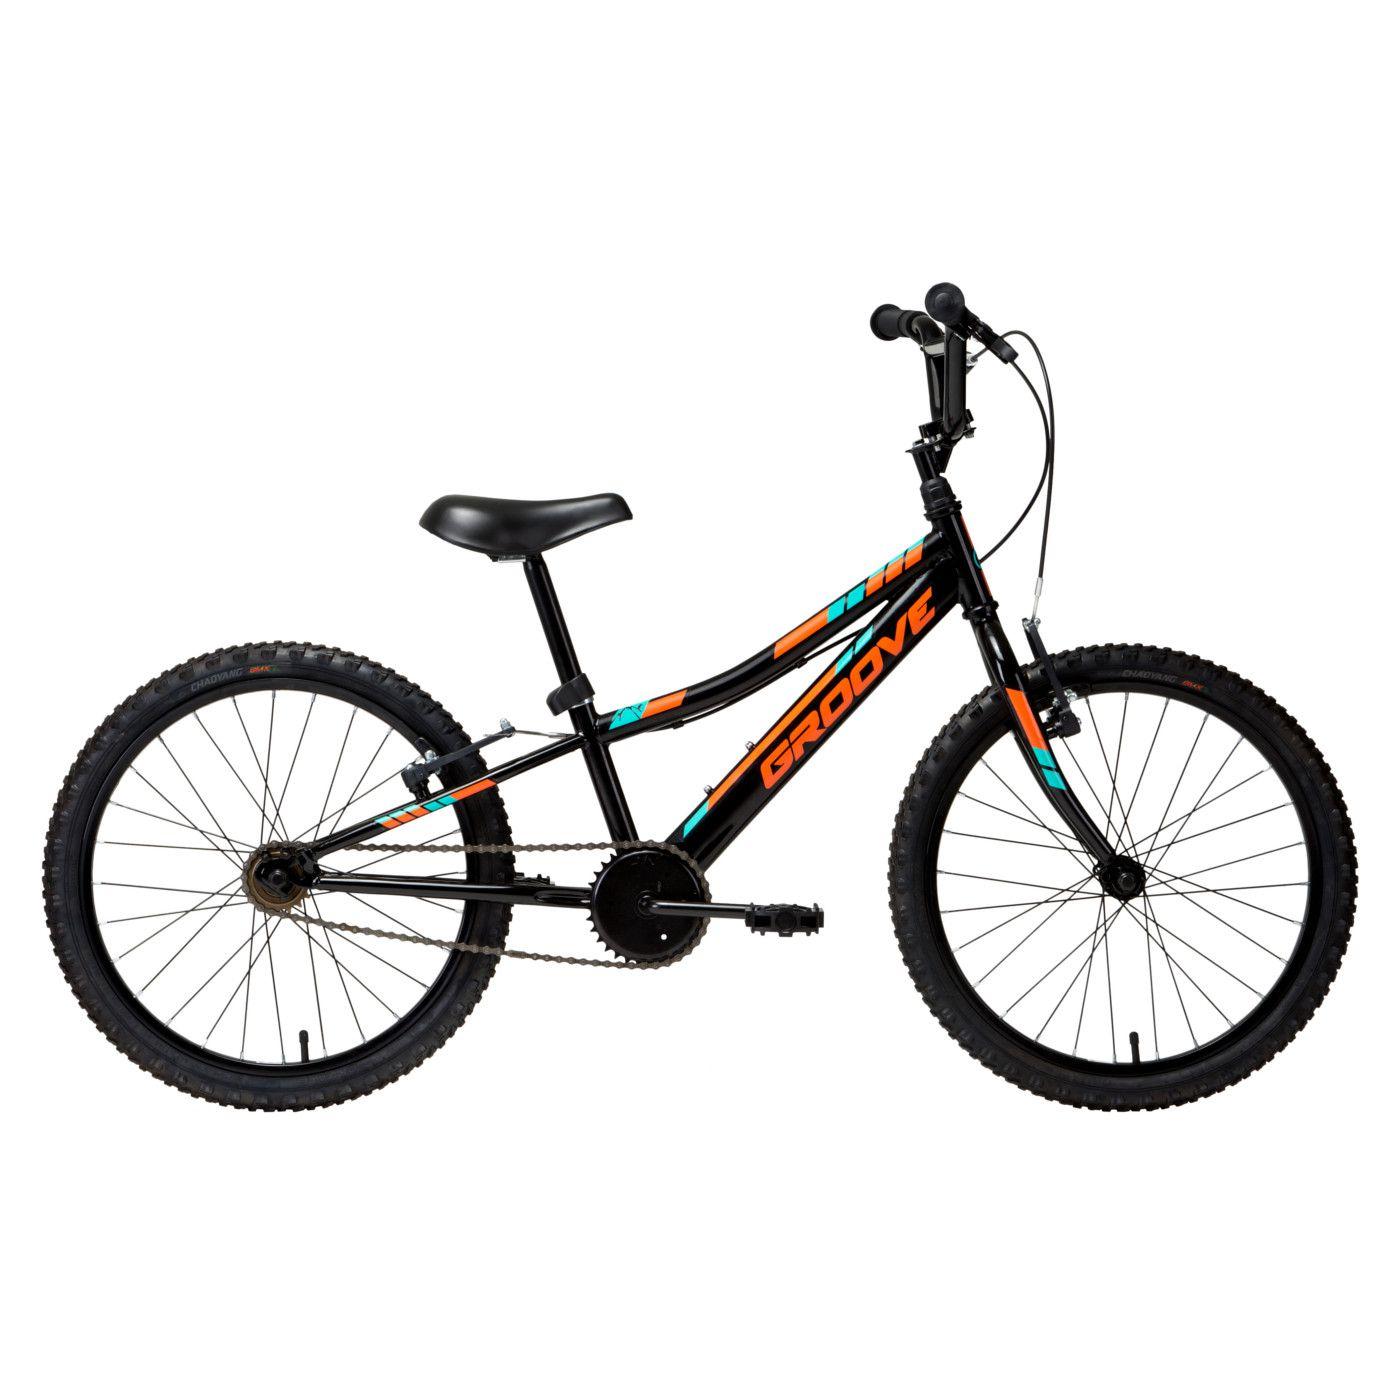 Bicicleta Infantil Groove Ragga Kids Aro 20 2019